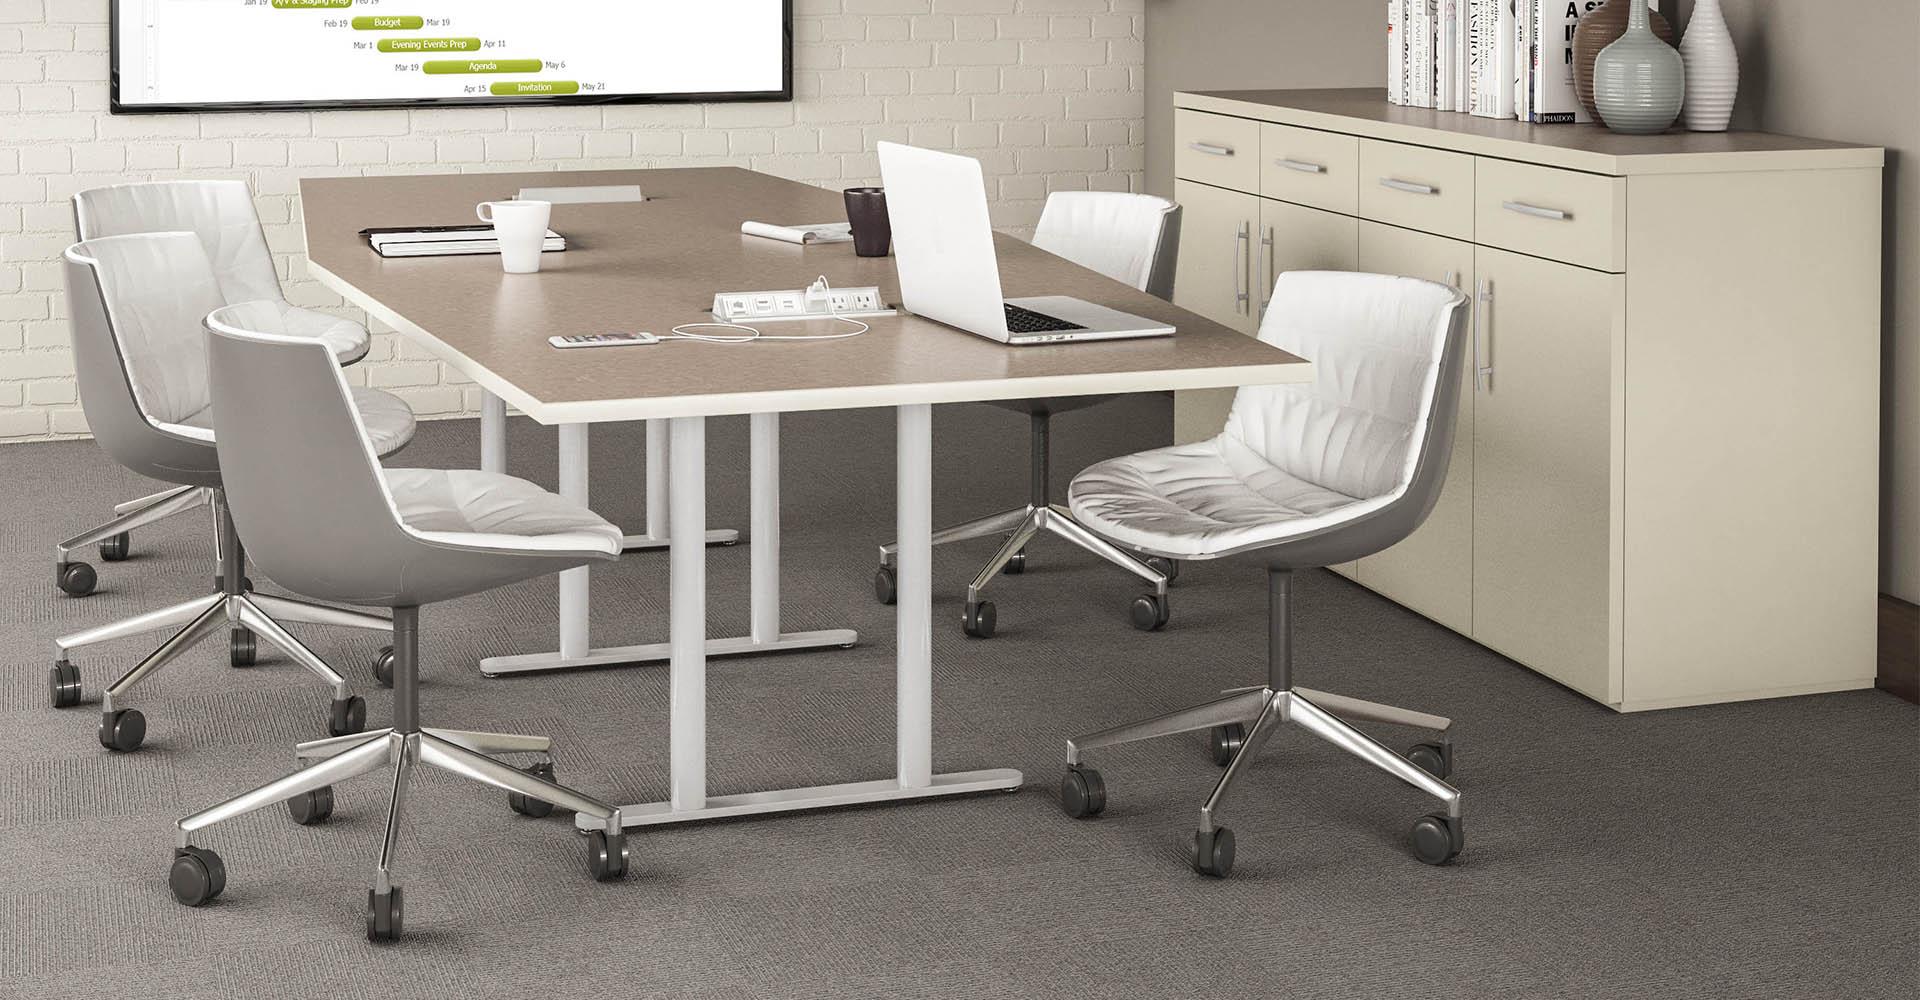 46 office furniture royal oak mi bdi 6003 6007 for Office design furnishings ypsilanti mi